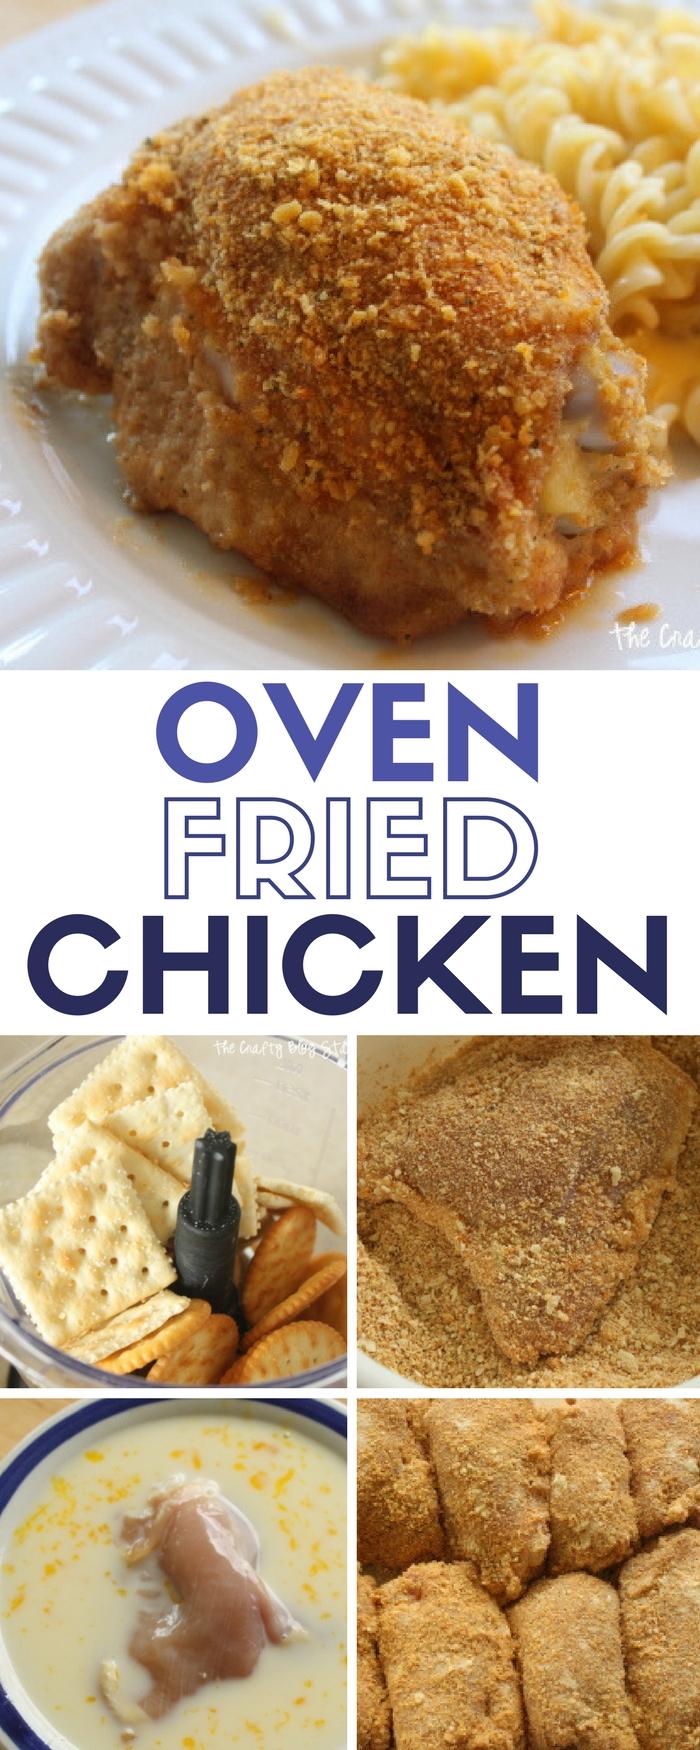 Oven Fried Chicken | Dinner Recipe | Tenders | Thighs | Drumsticks | Wings |